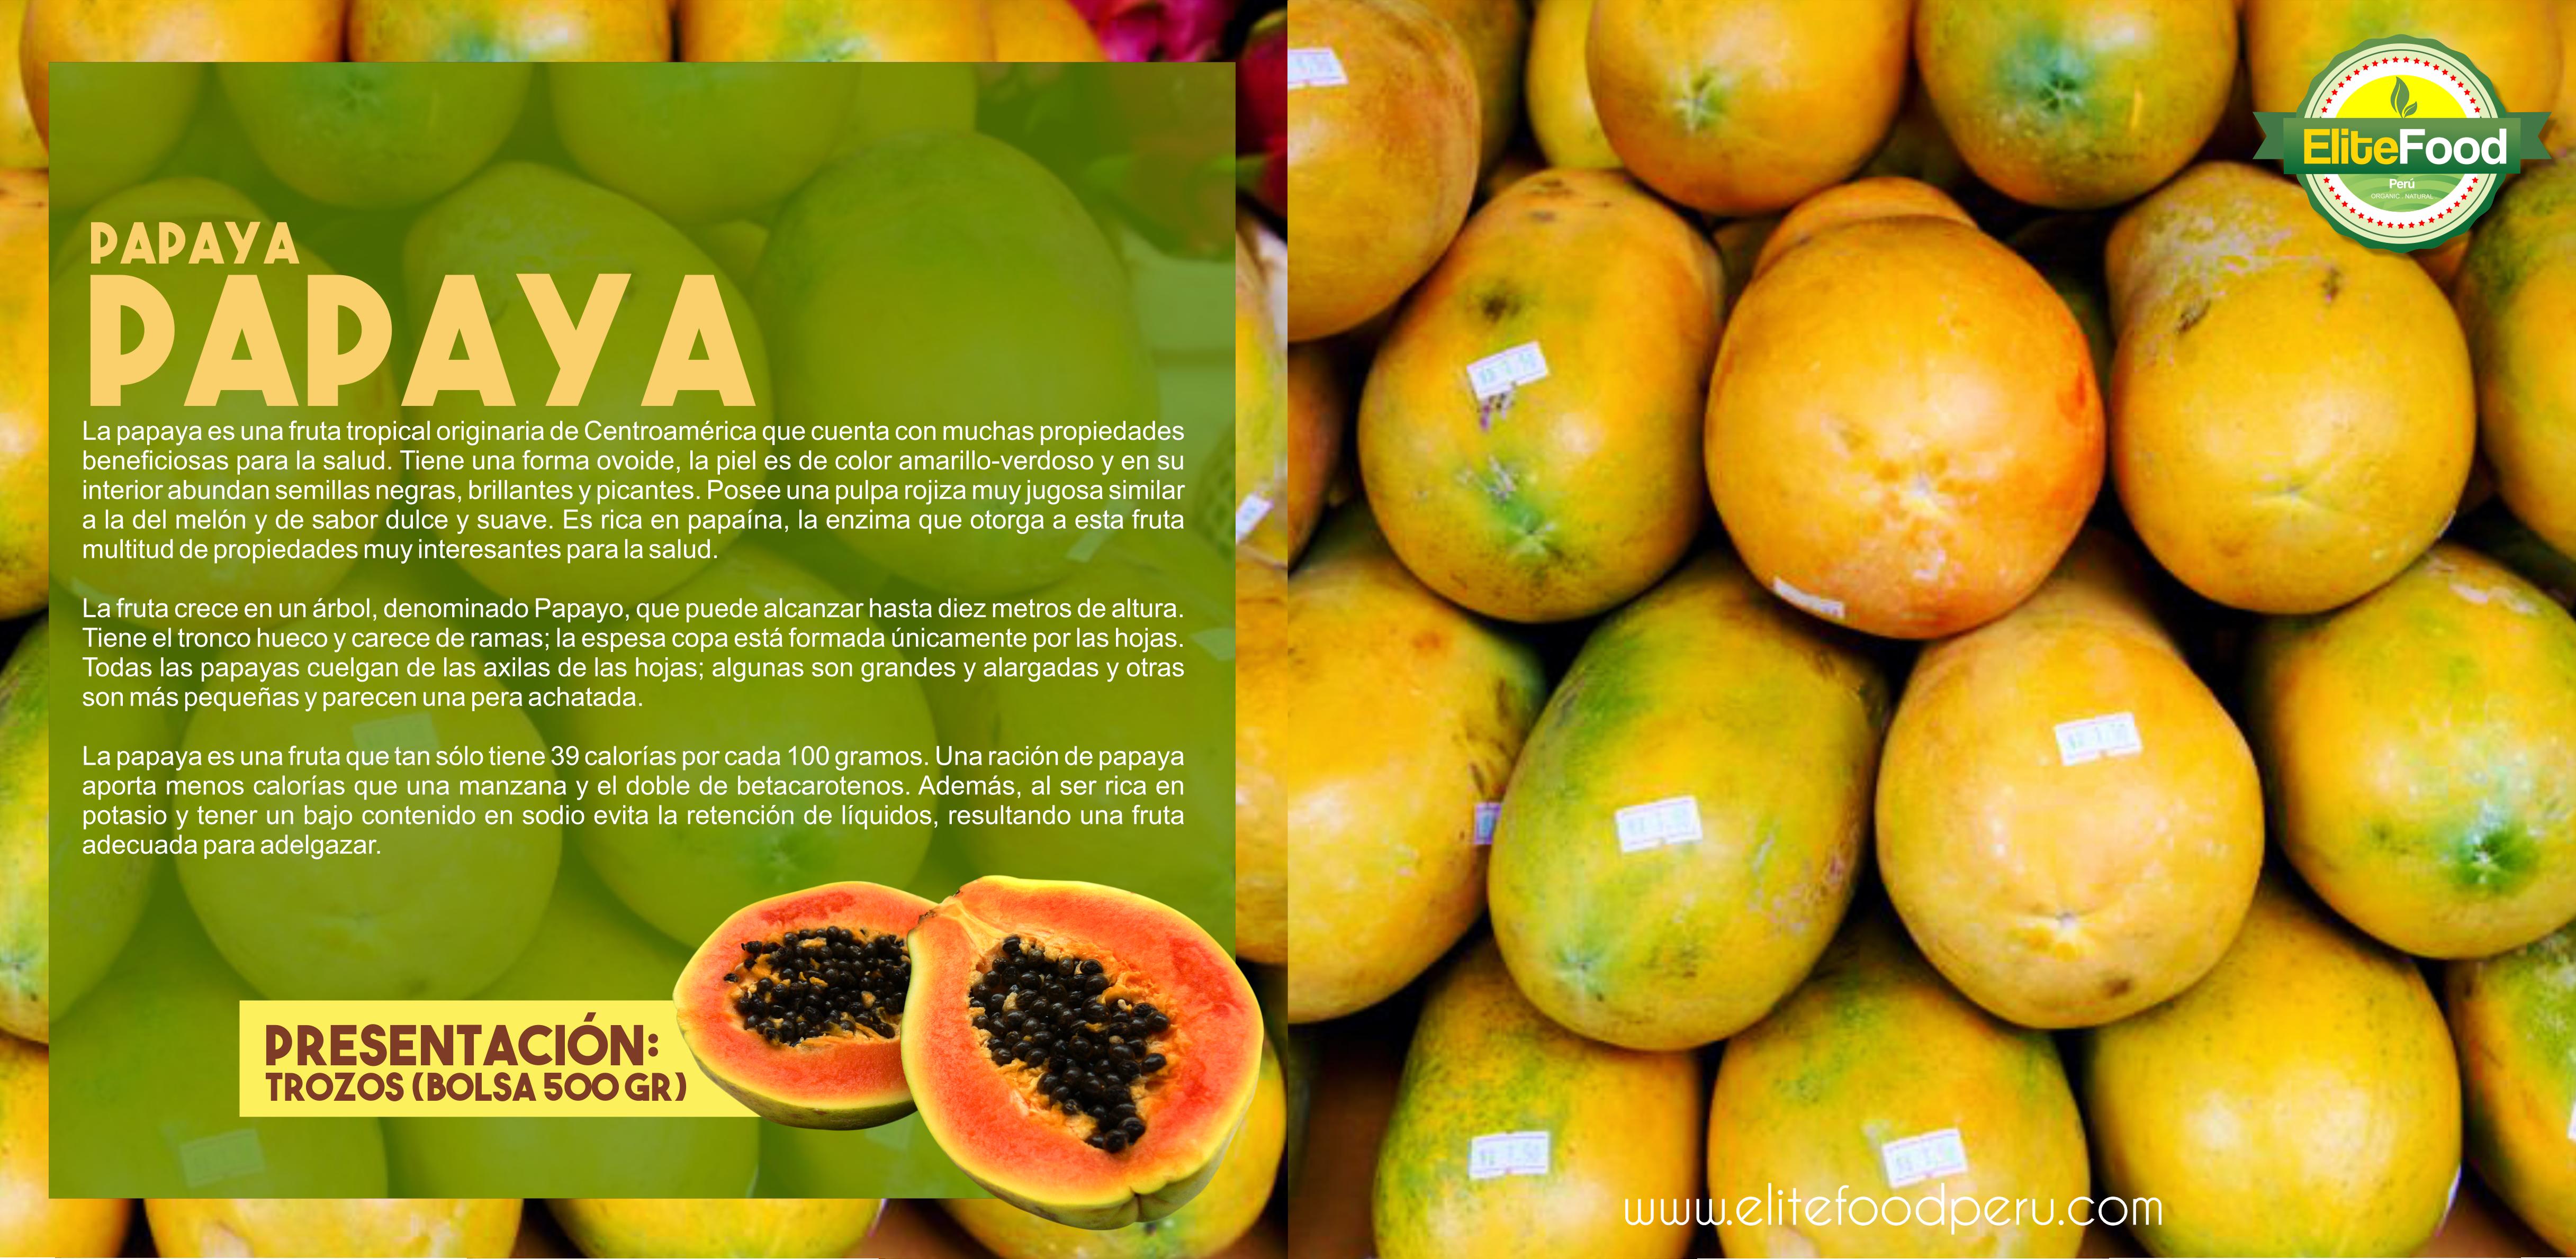 Elitefoodperu Catalogo Frutas